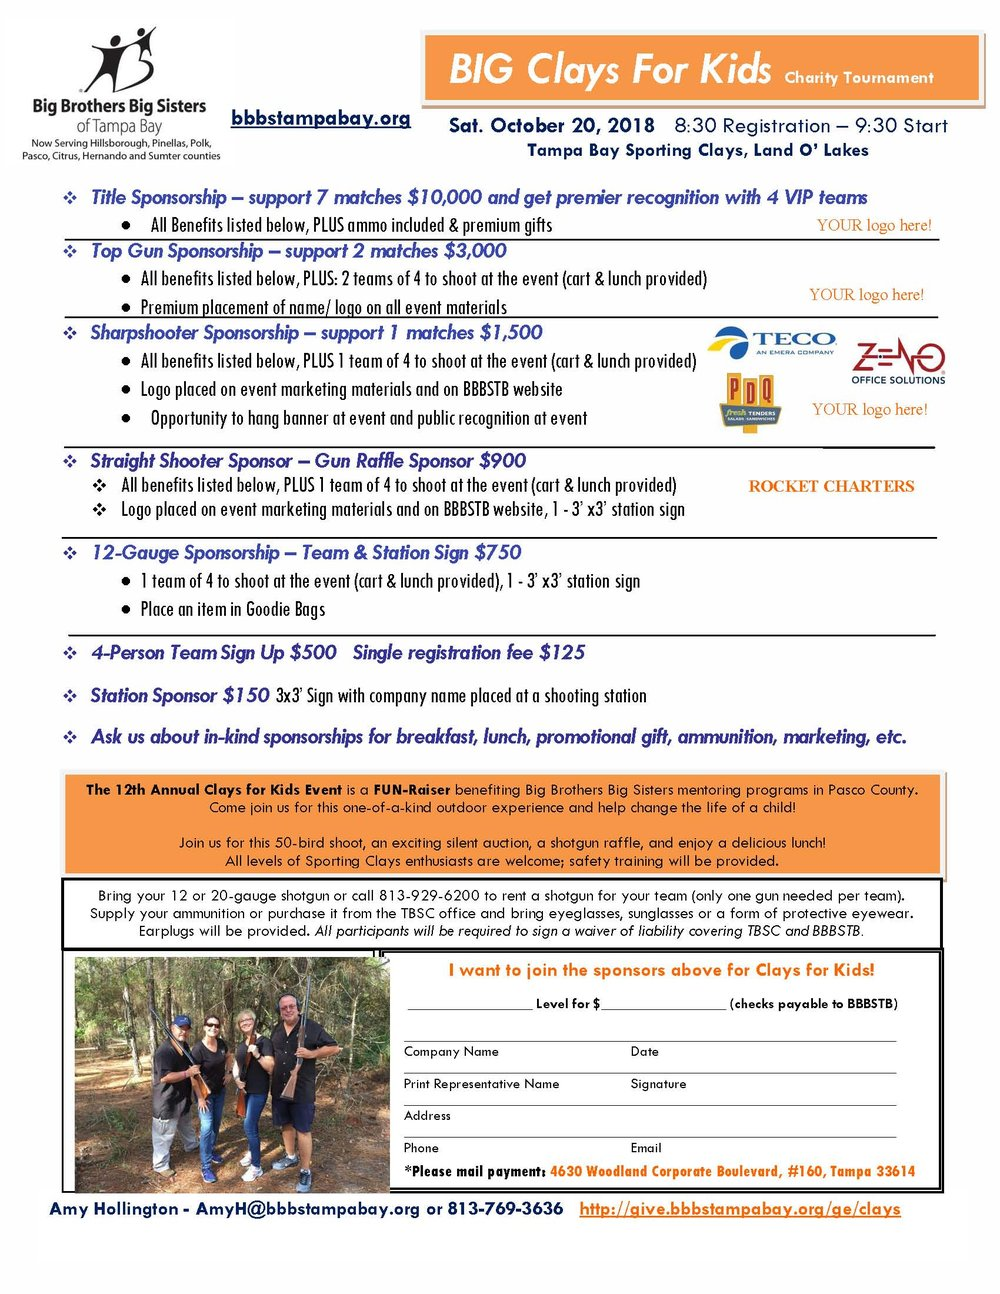 BBBS BIG Clays for Kids Sponsorship Sheet 10-20-18.jpg